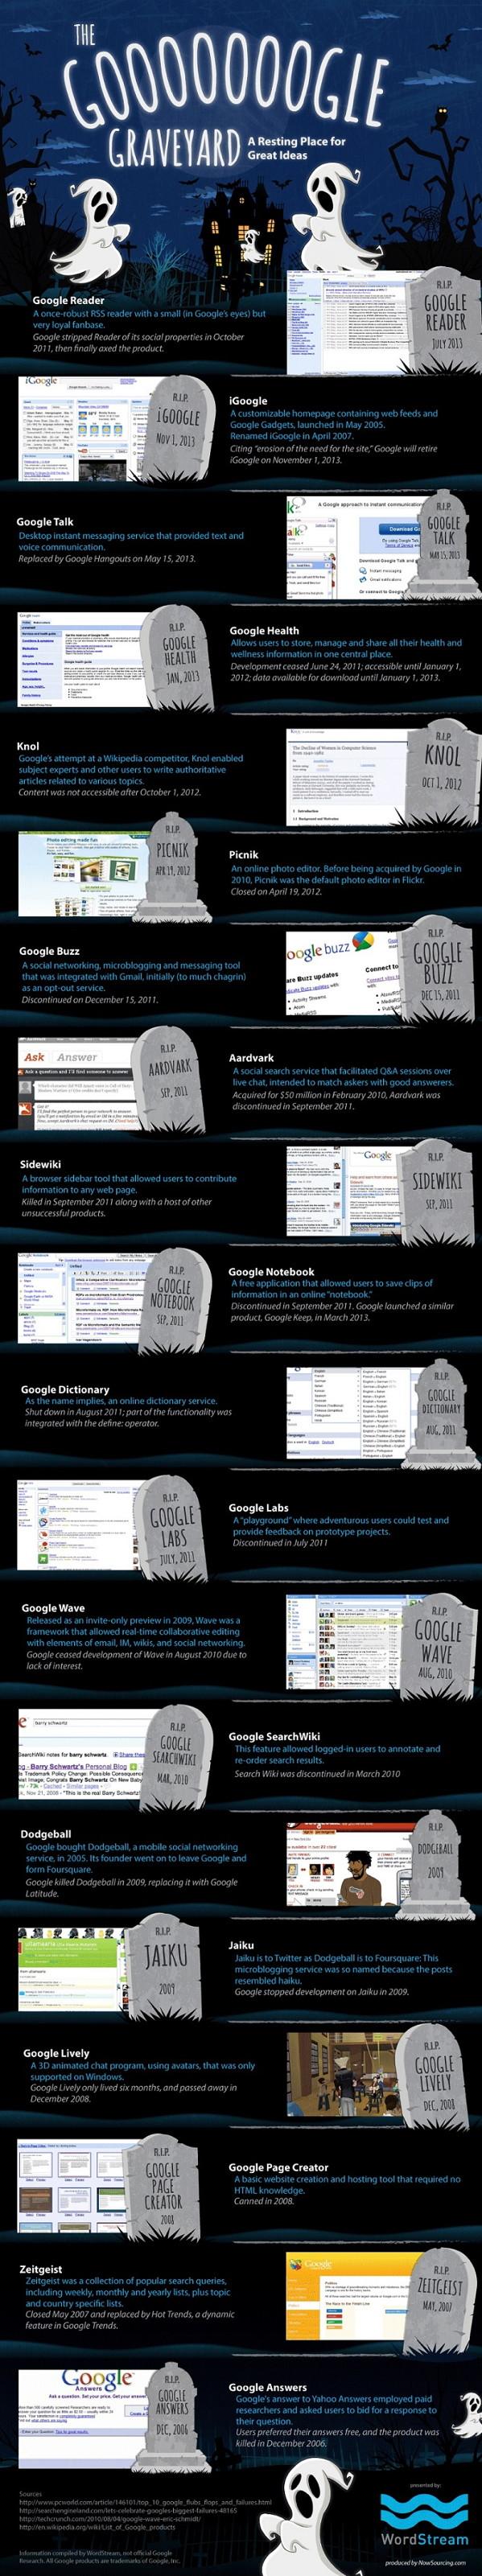 Google_Graveyard